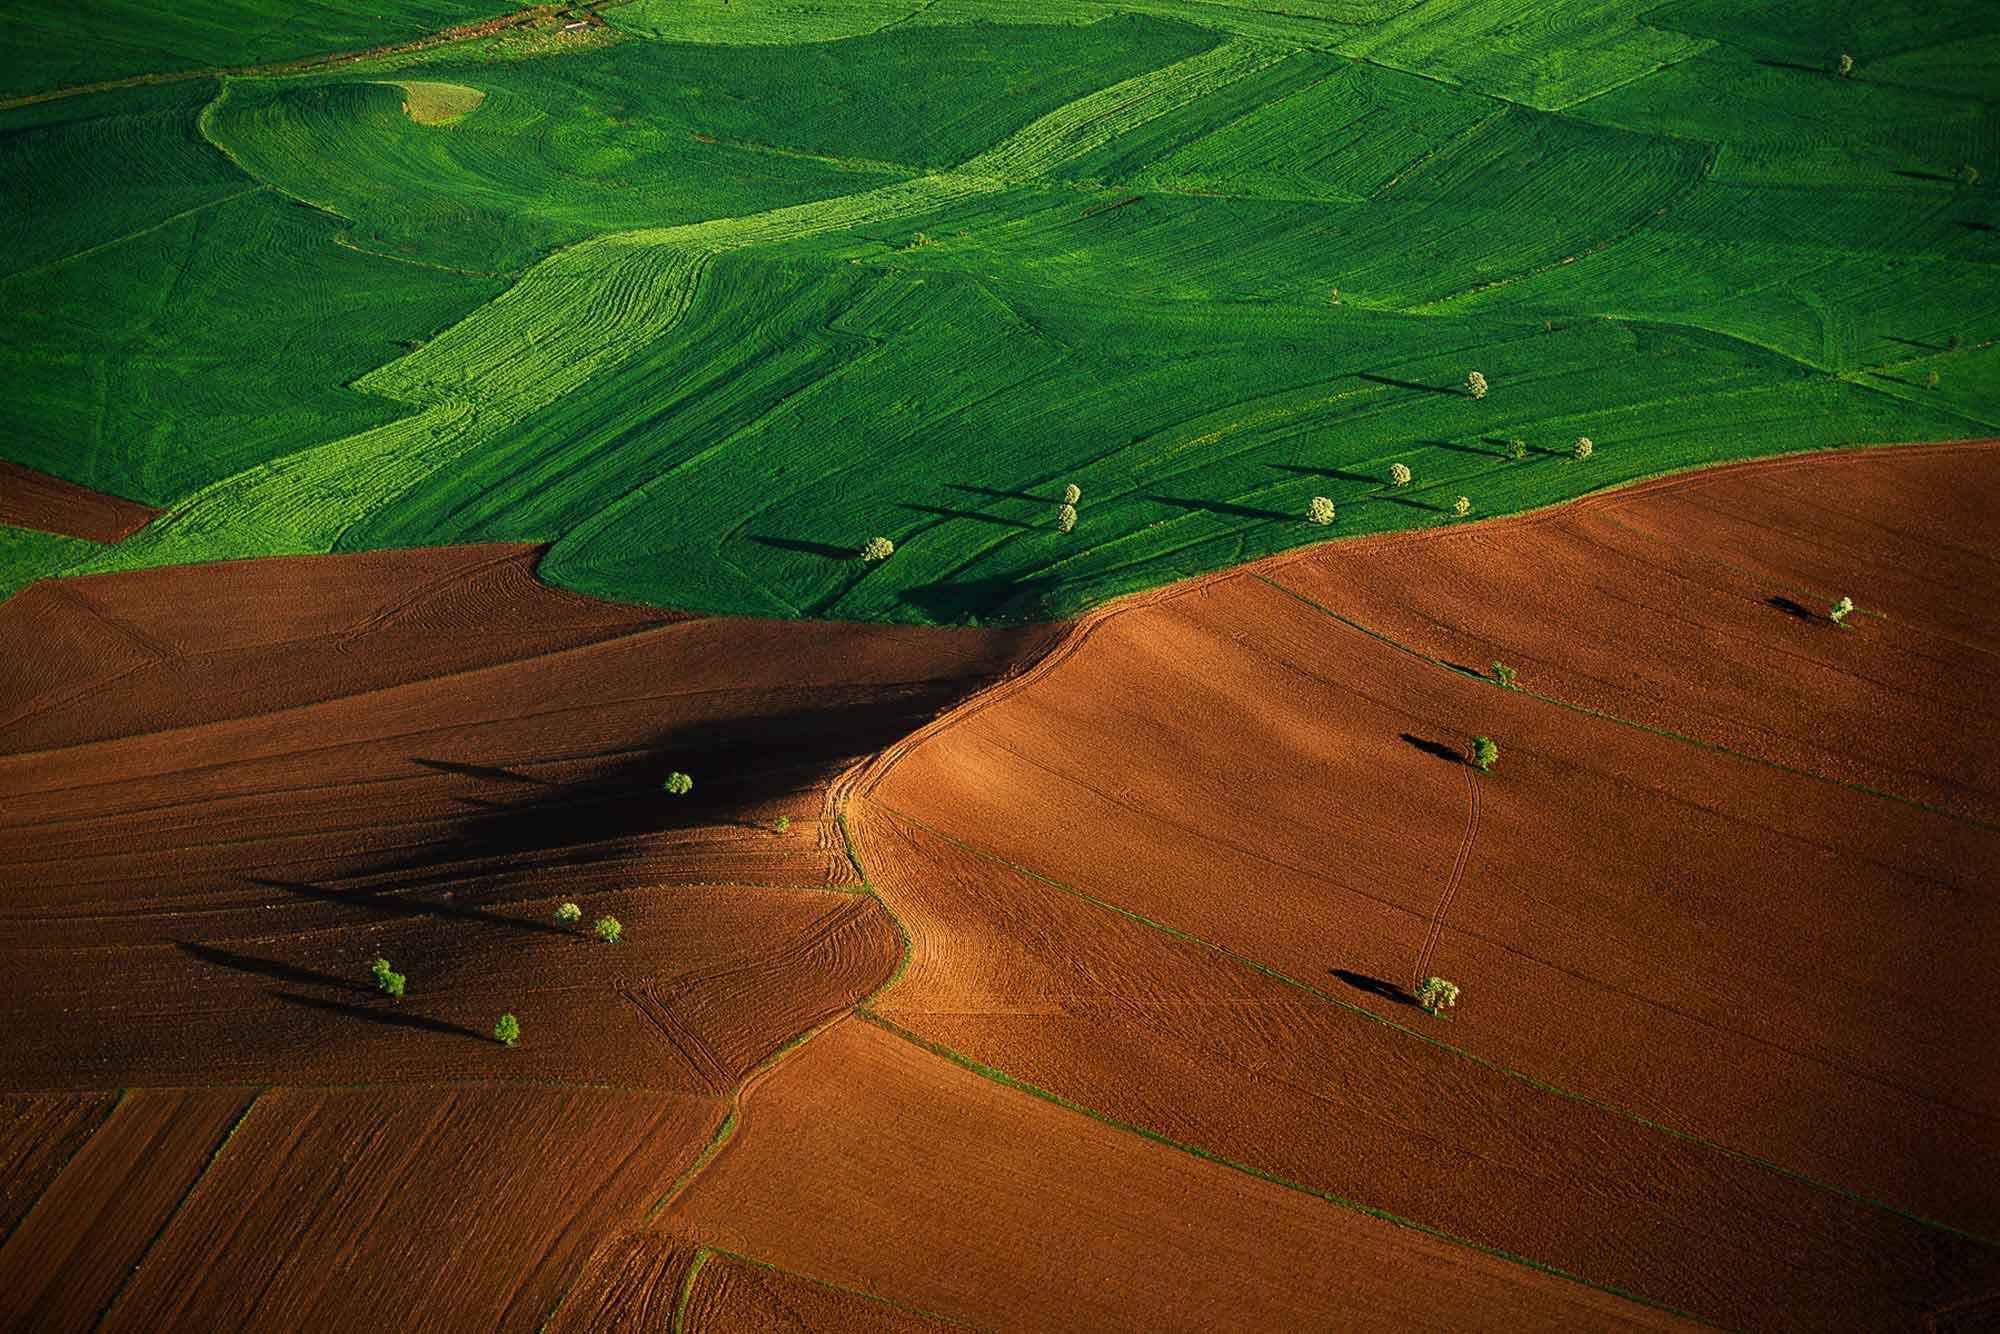 Anatolia - Yann Arthus-Bertrand